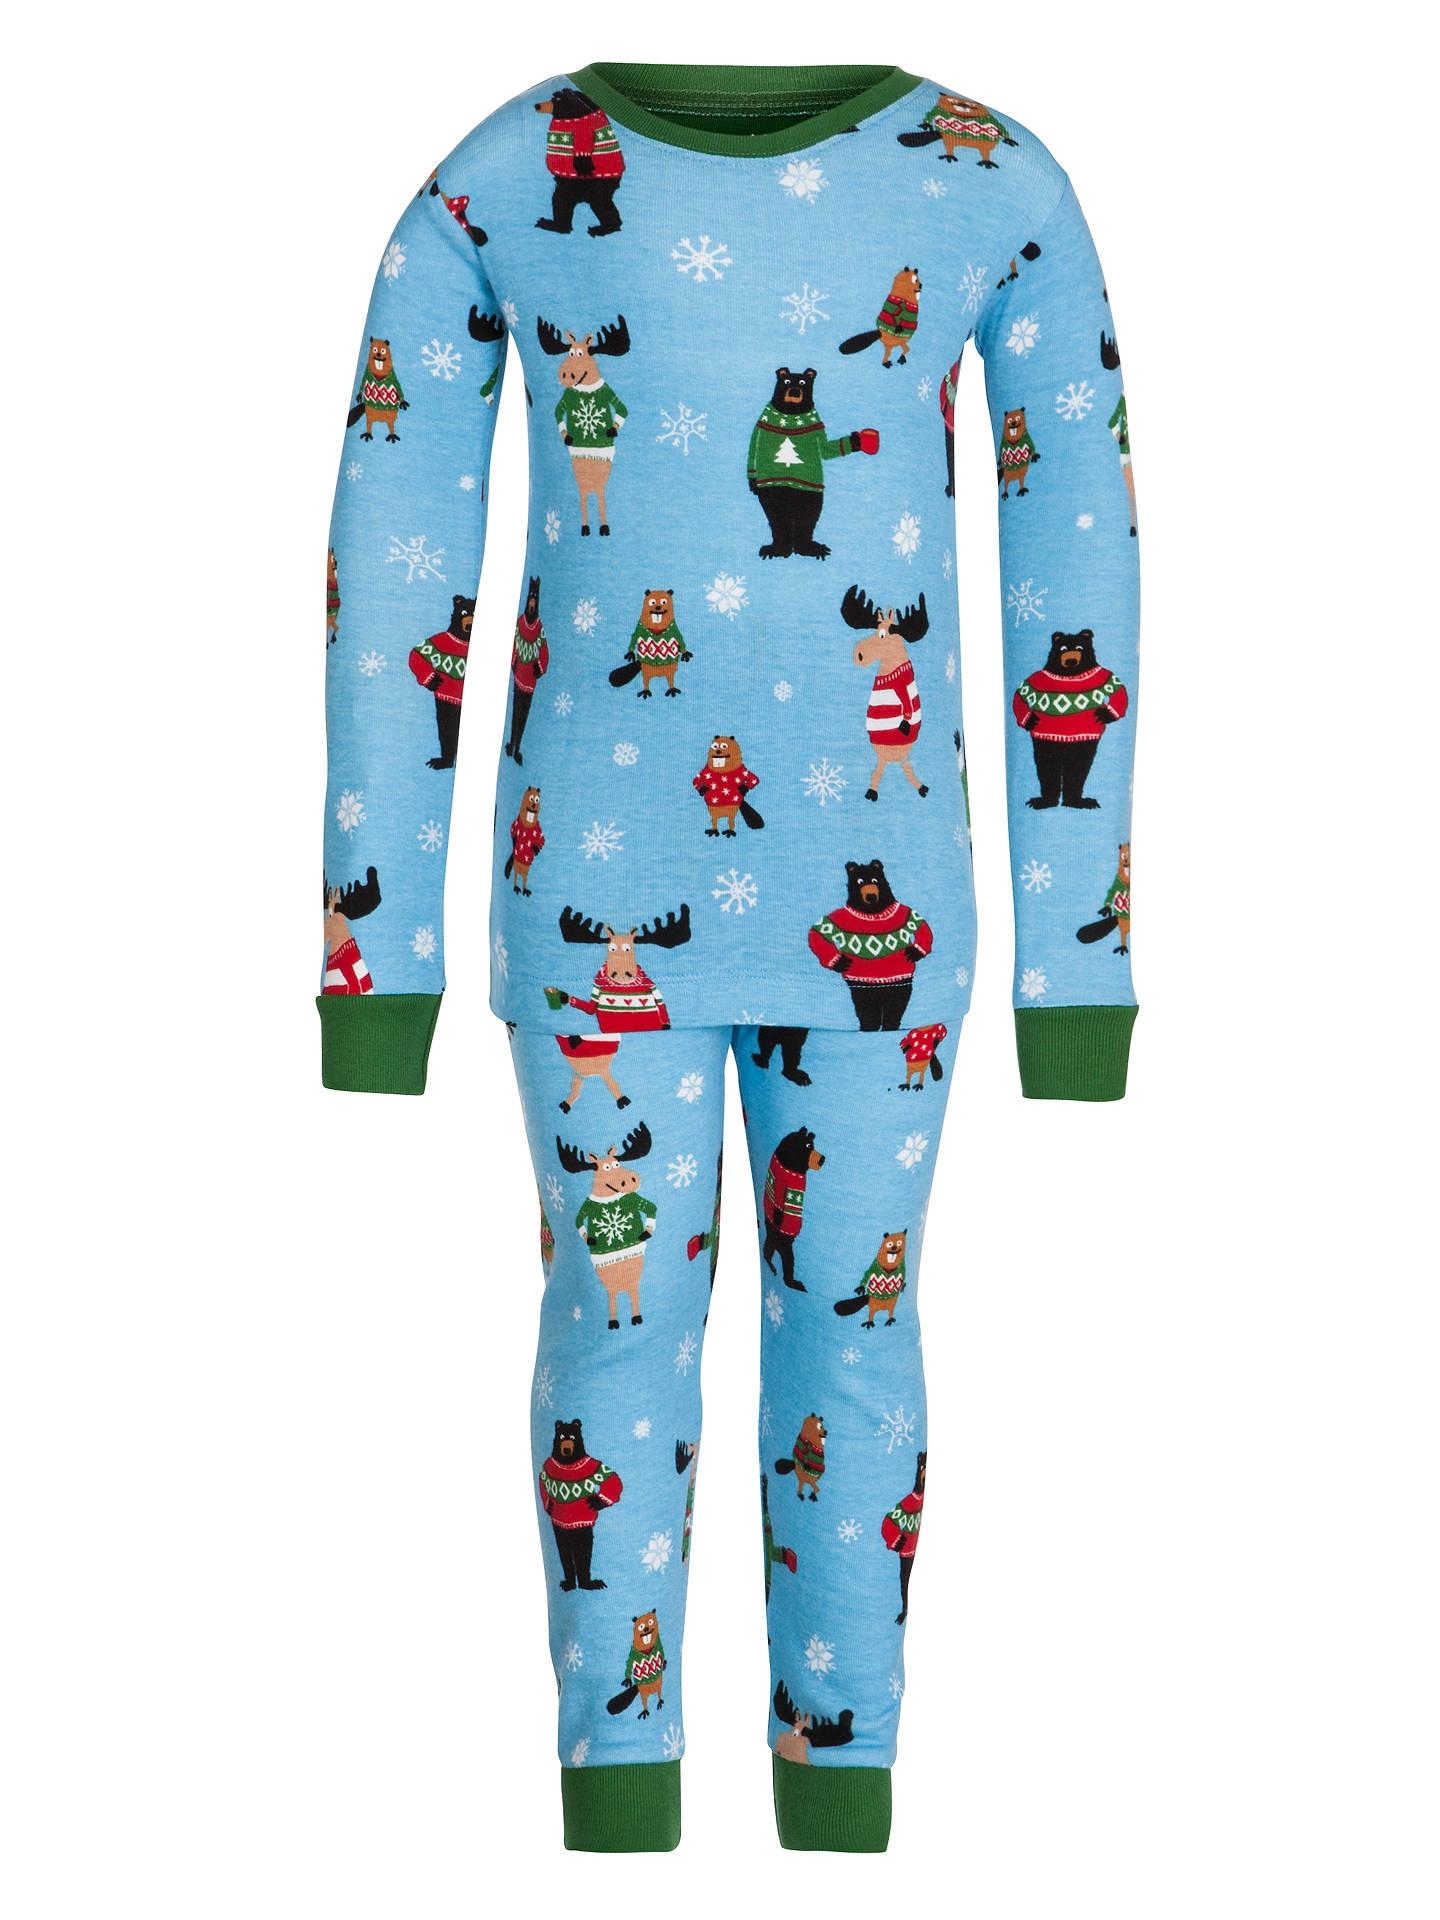 735c0d61c31f Buy Hatley Boys  Christmas Pyjamas